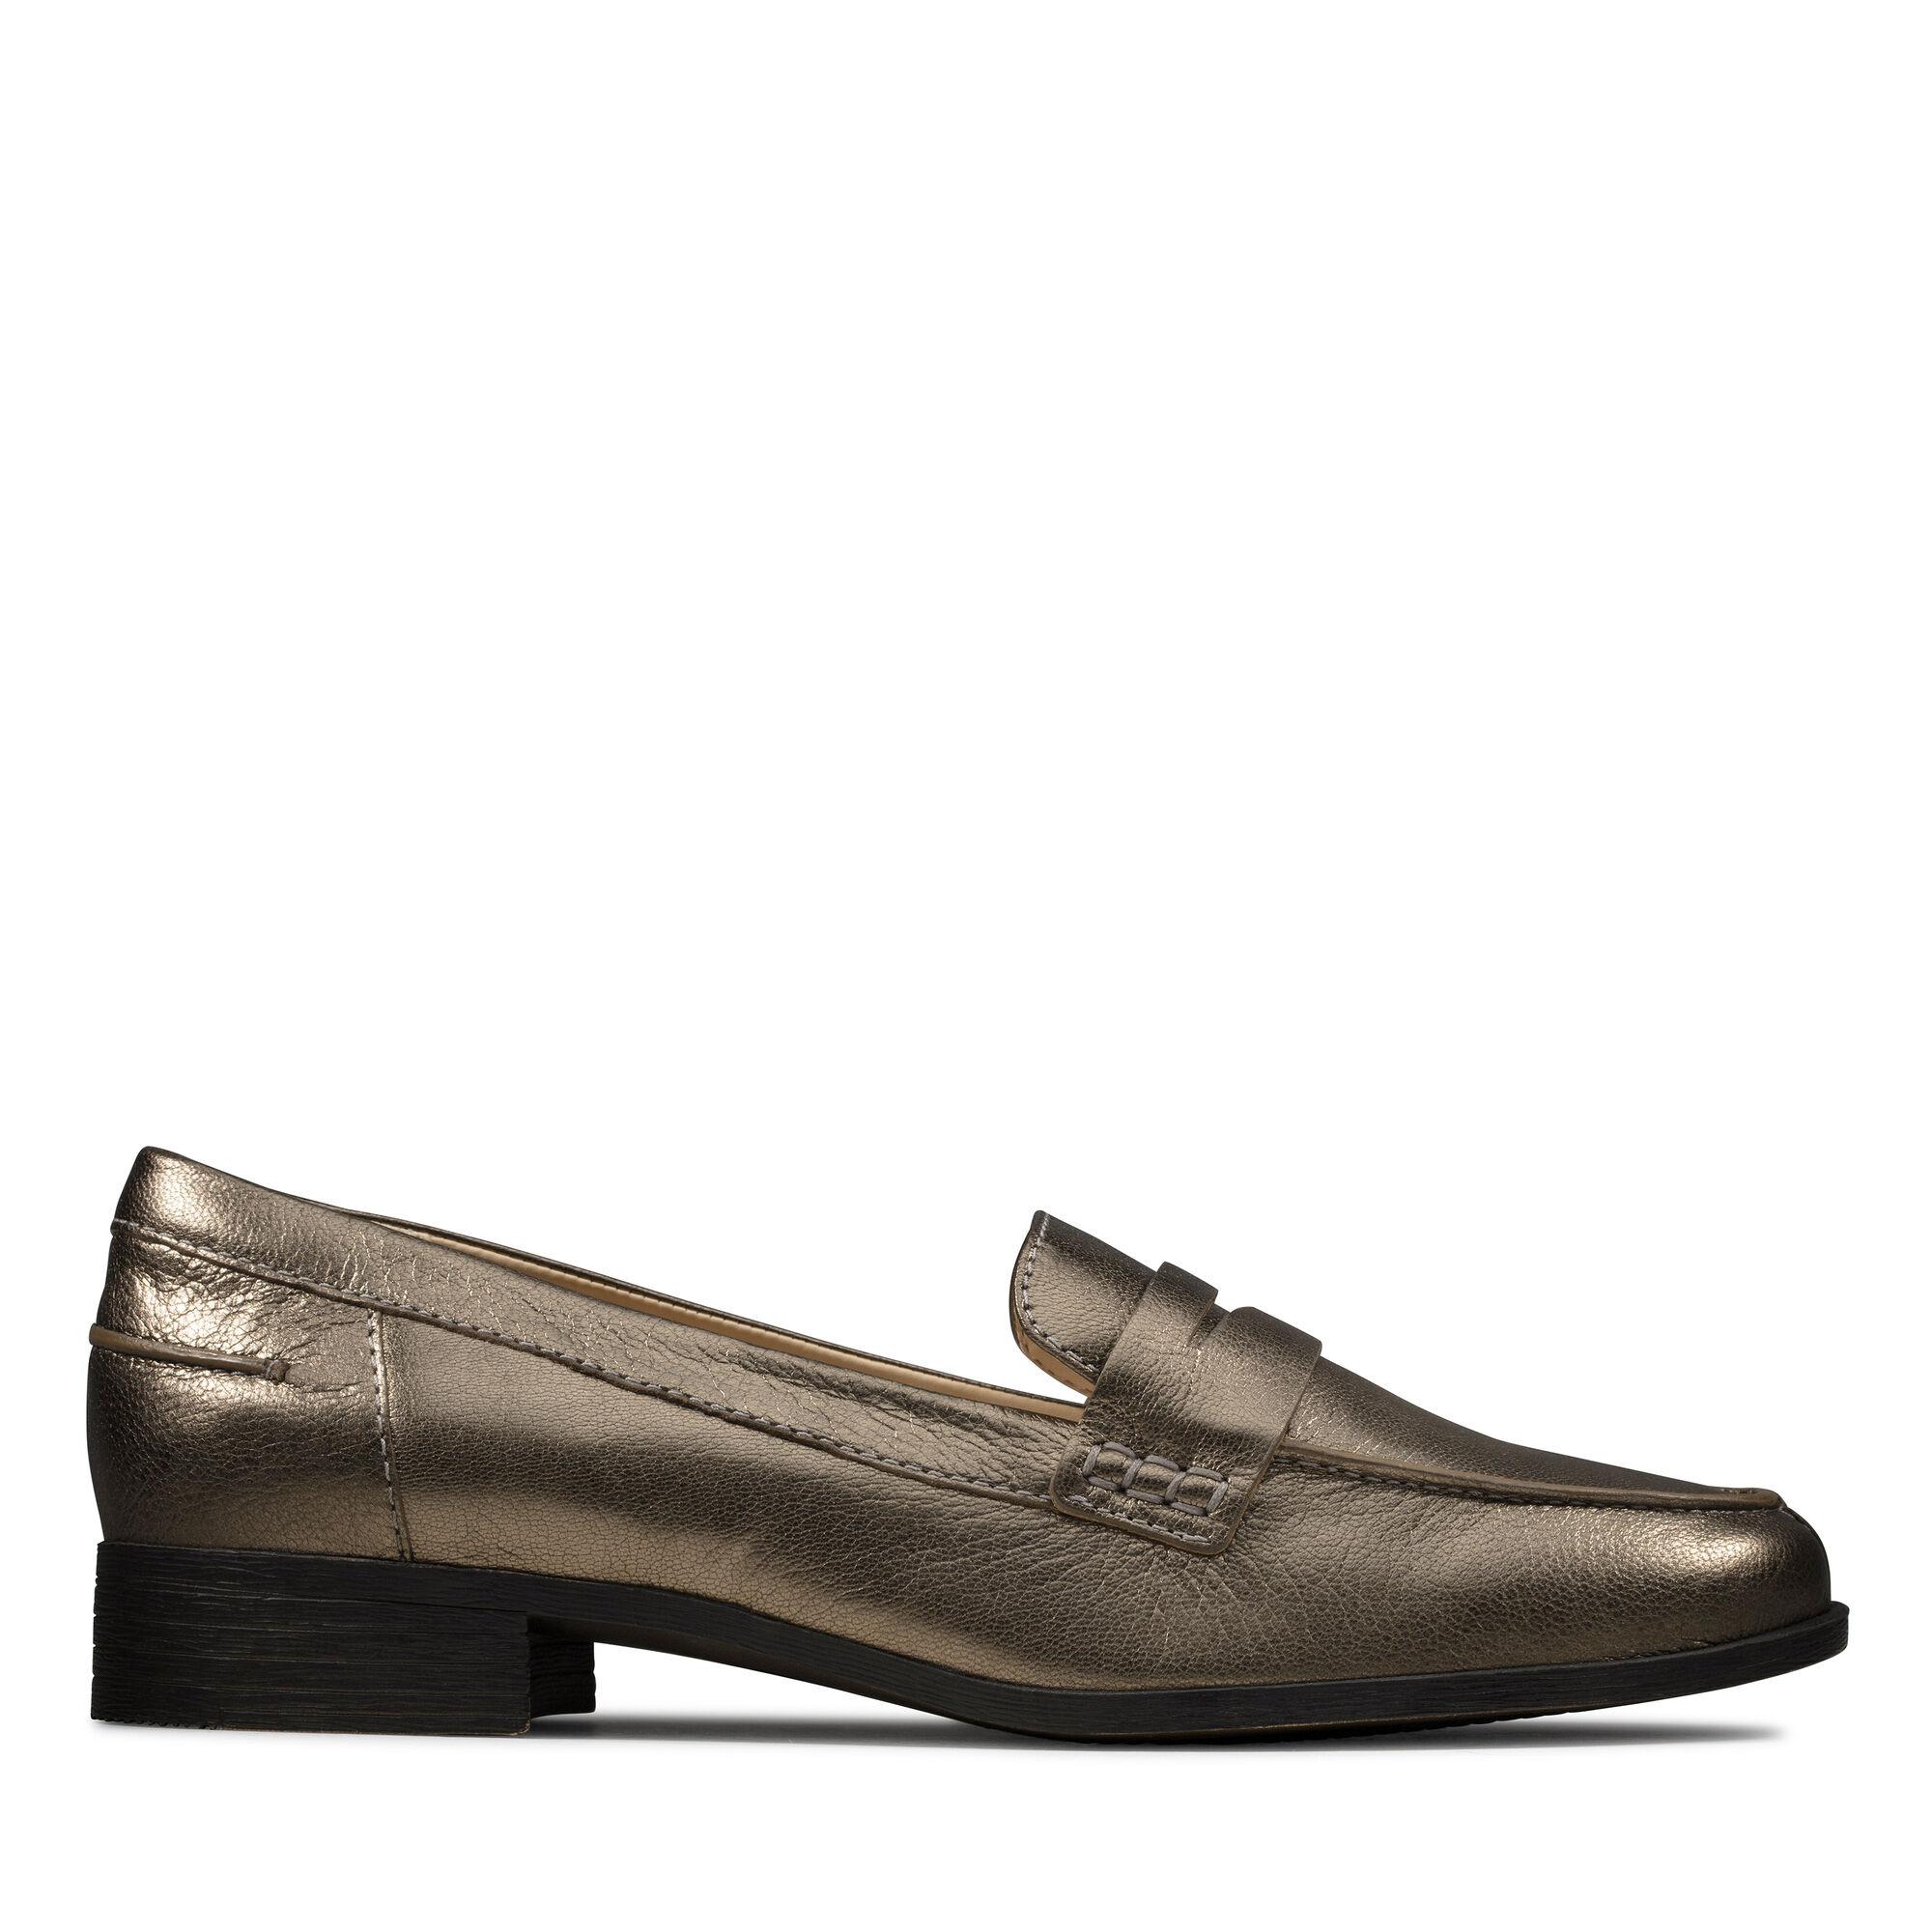 golf bosque hoy  Zapatos para Hombre Clarks Originals Trigenic Flex en Gris-Cordones-Cuero  Completo control-ar.com.ar